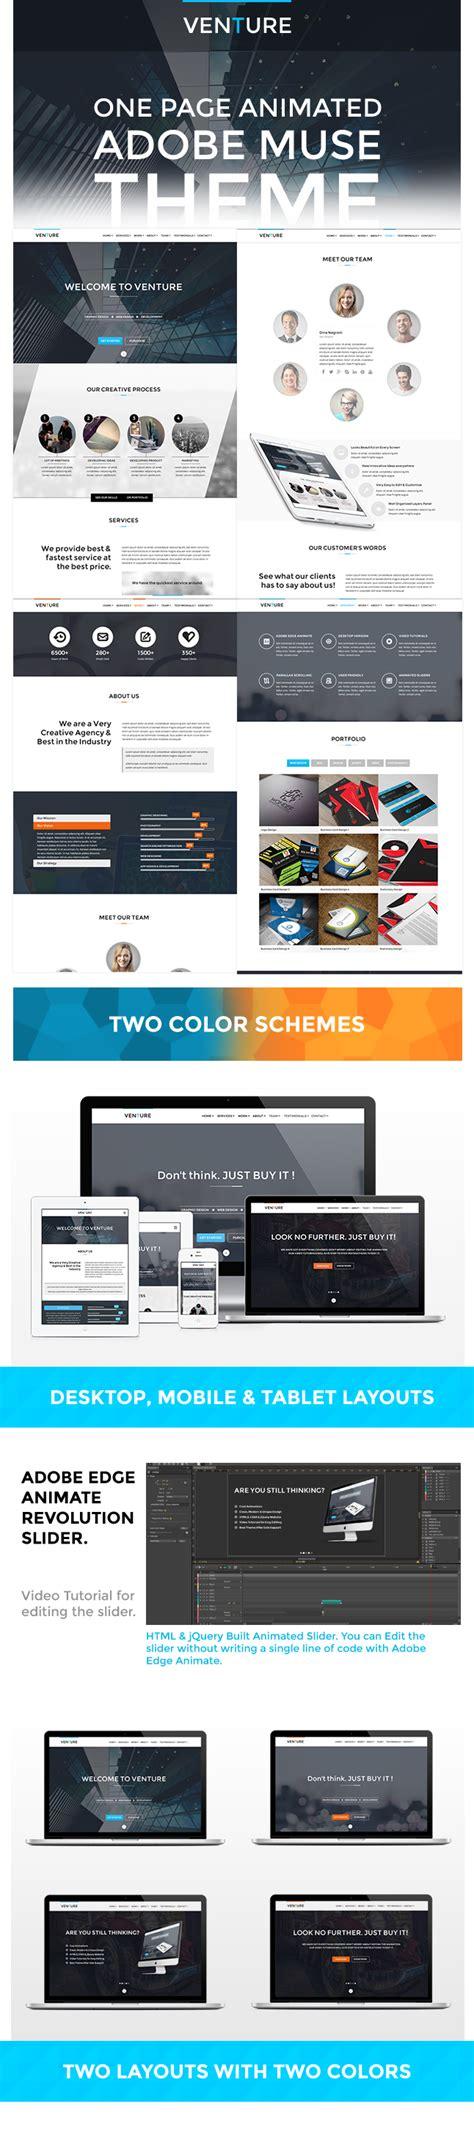 Venutre Adobe Muse Animated Website Template By Vmsdesigns On Deviantart Adobe Muse Website Templates